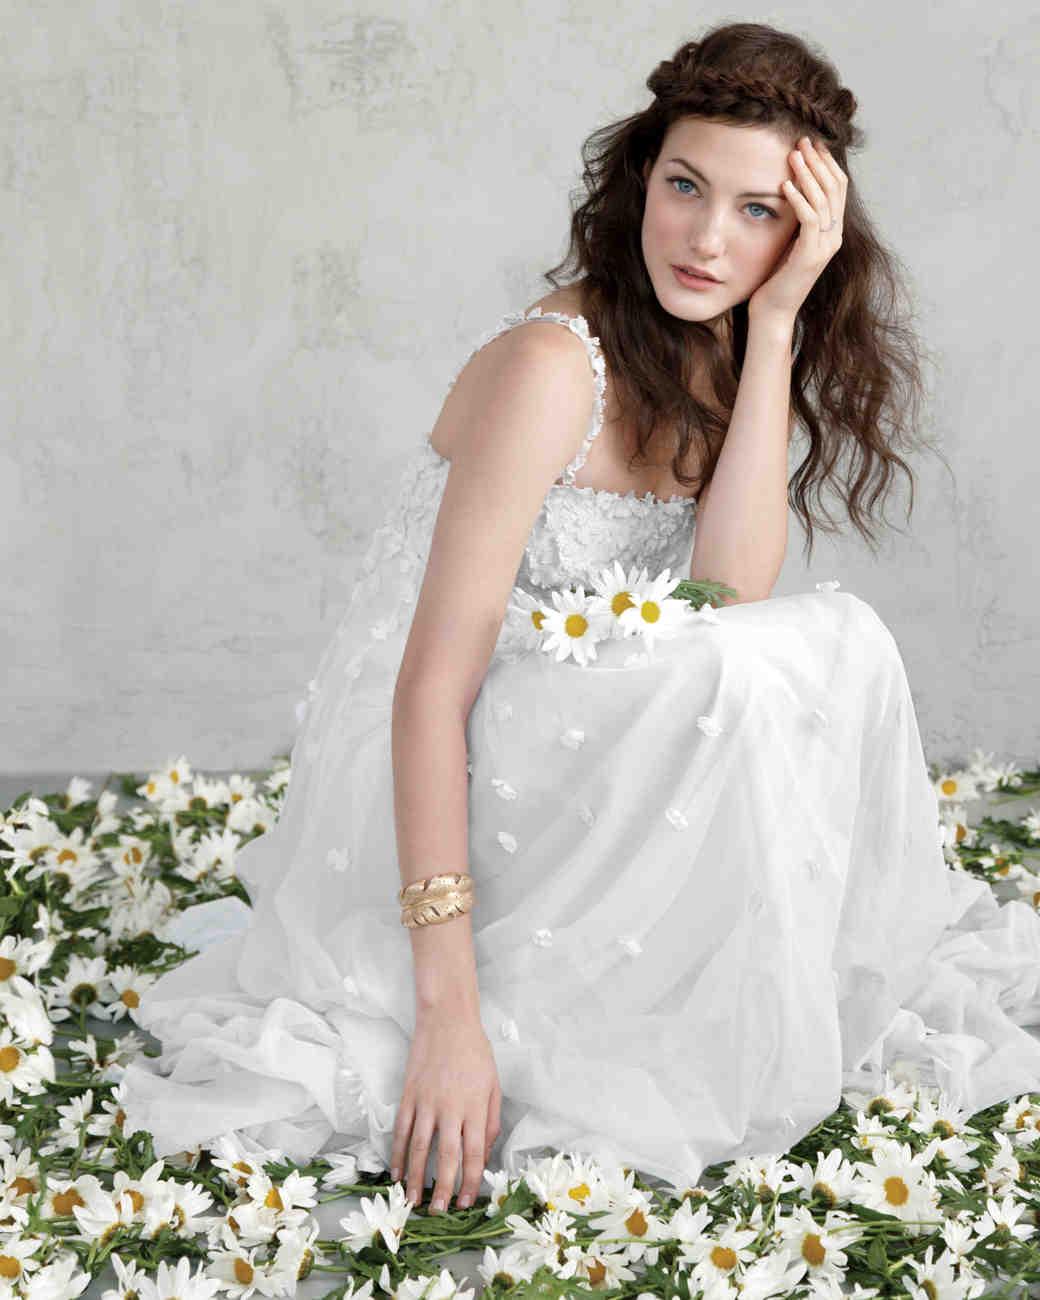 bohemian-bride-mwd107881.jpg